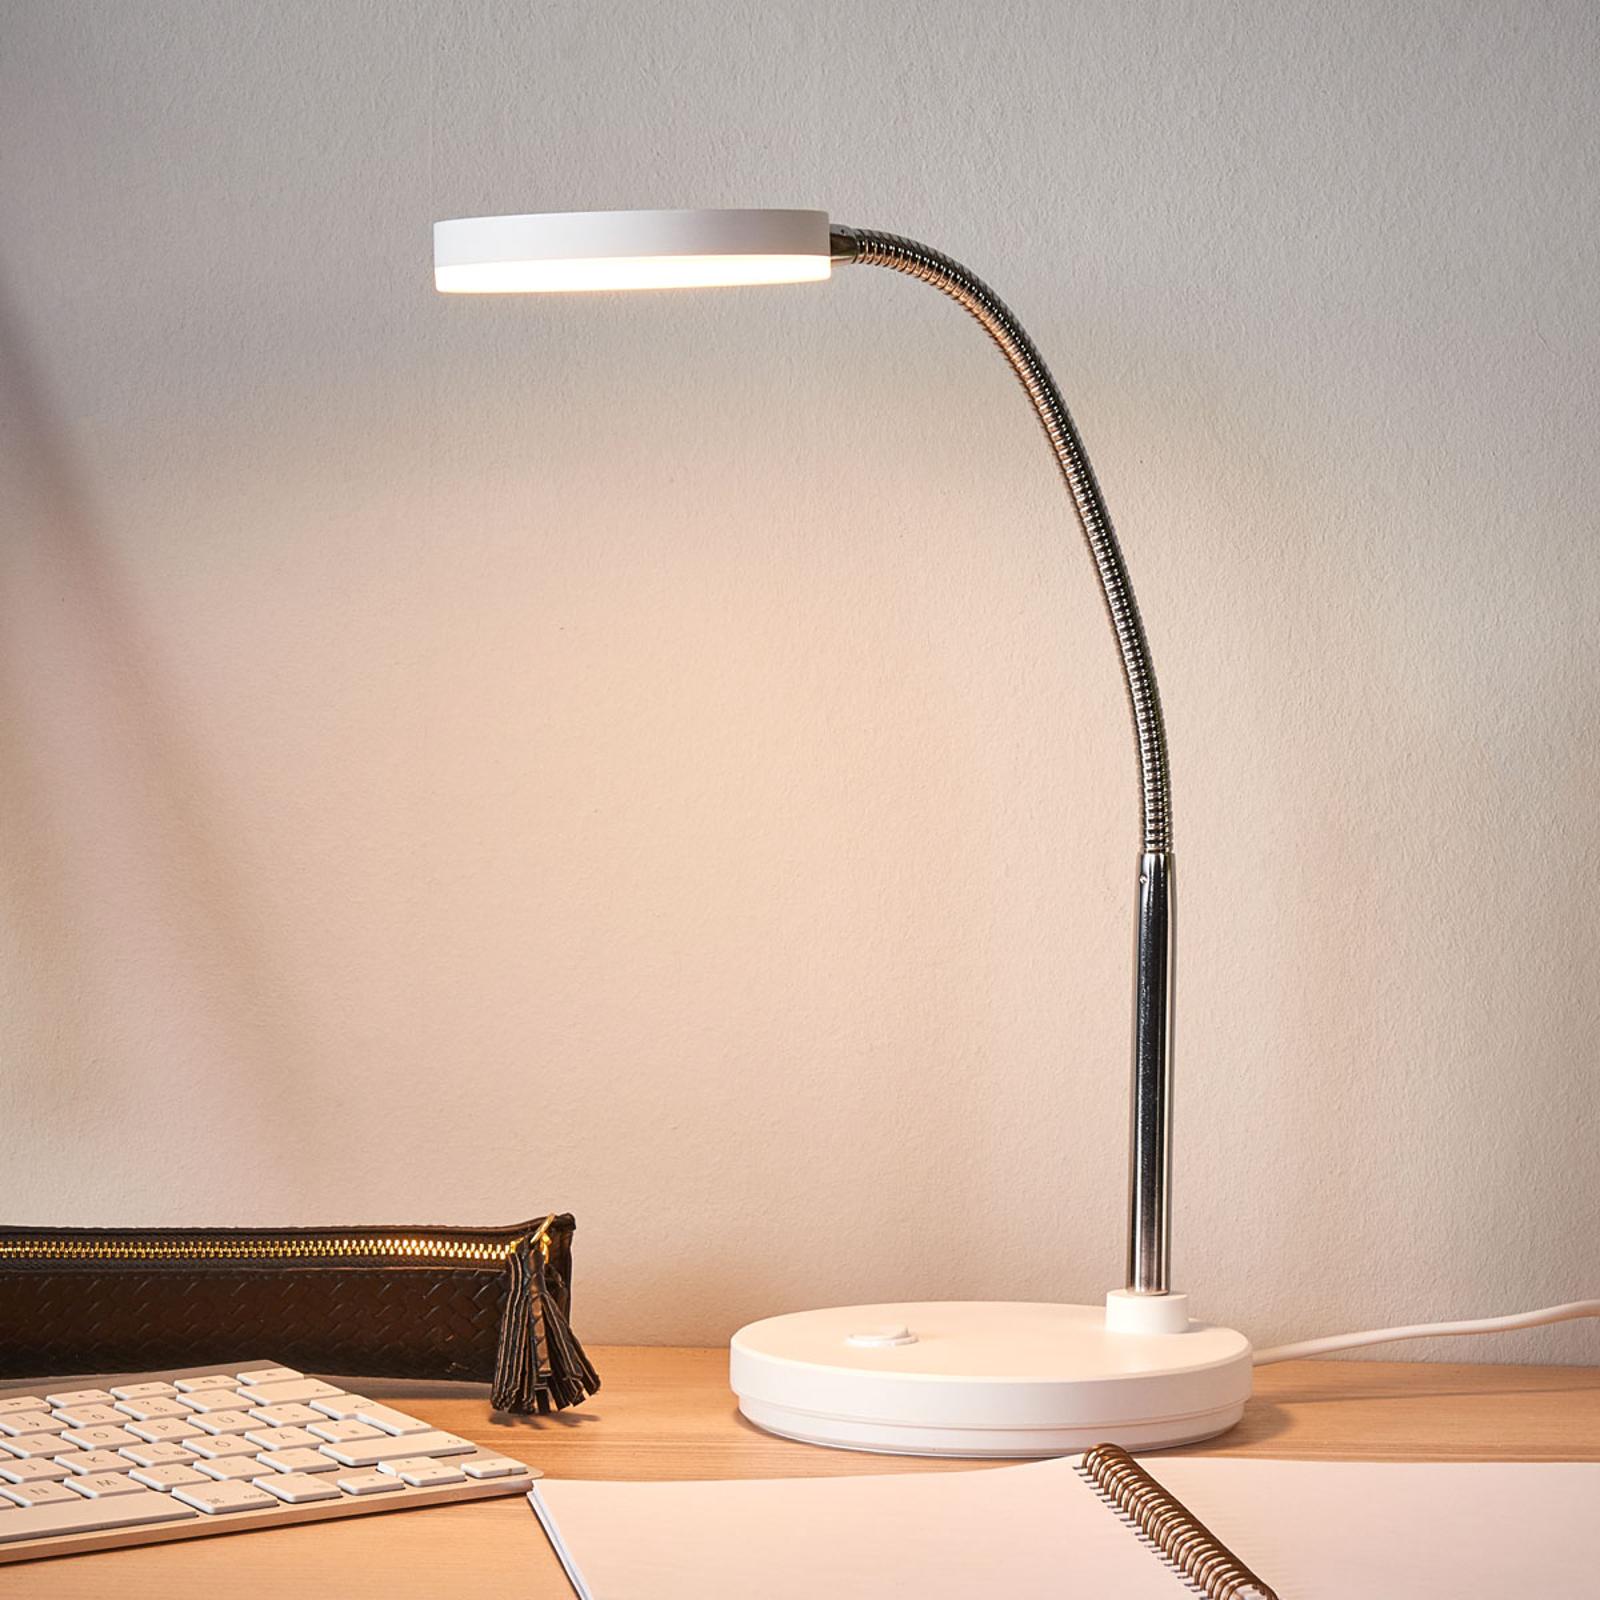 Biała lampka biurkowa LED Milow